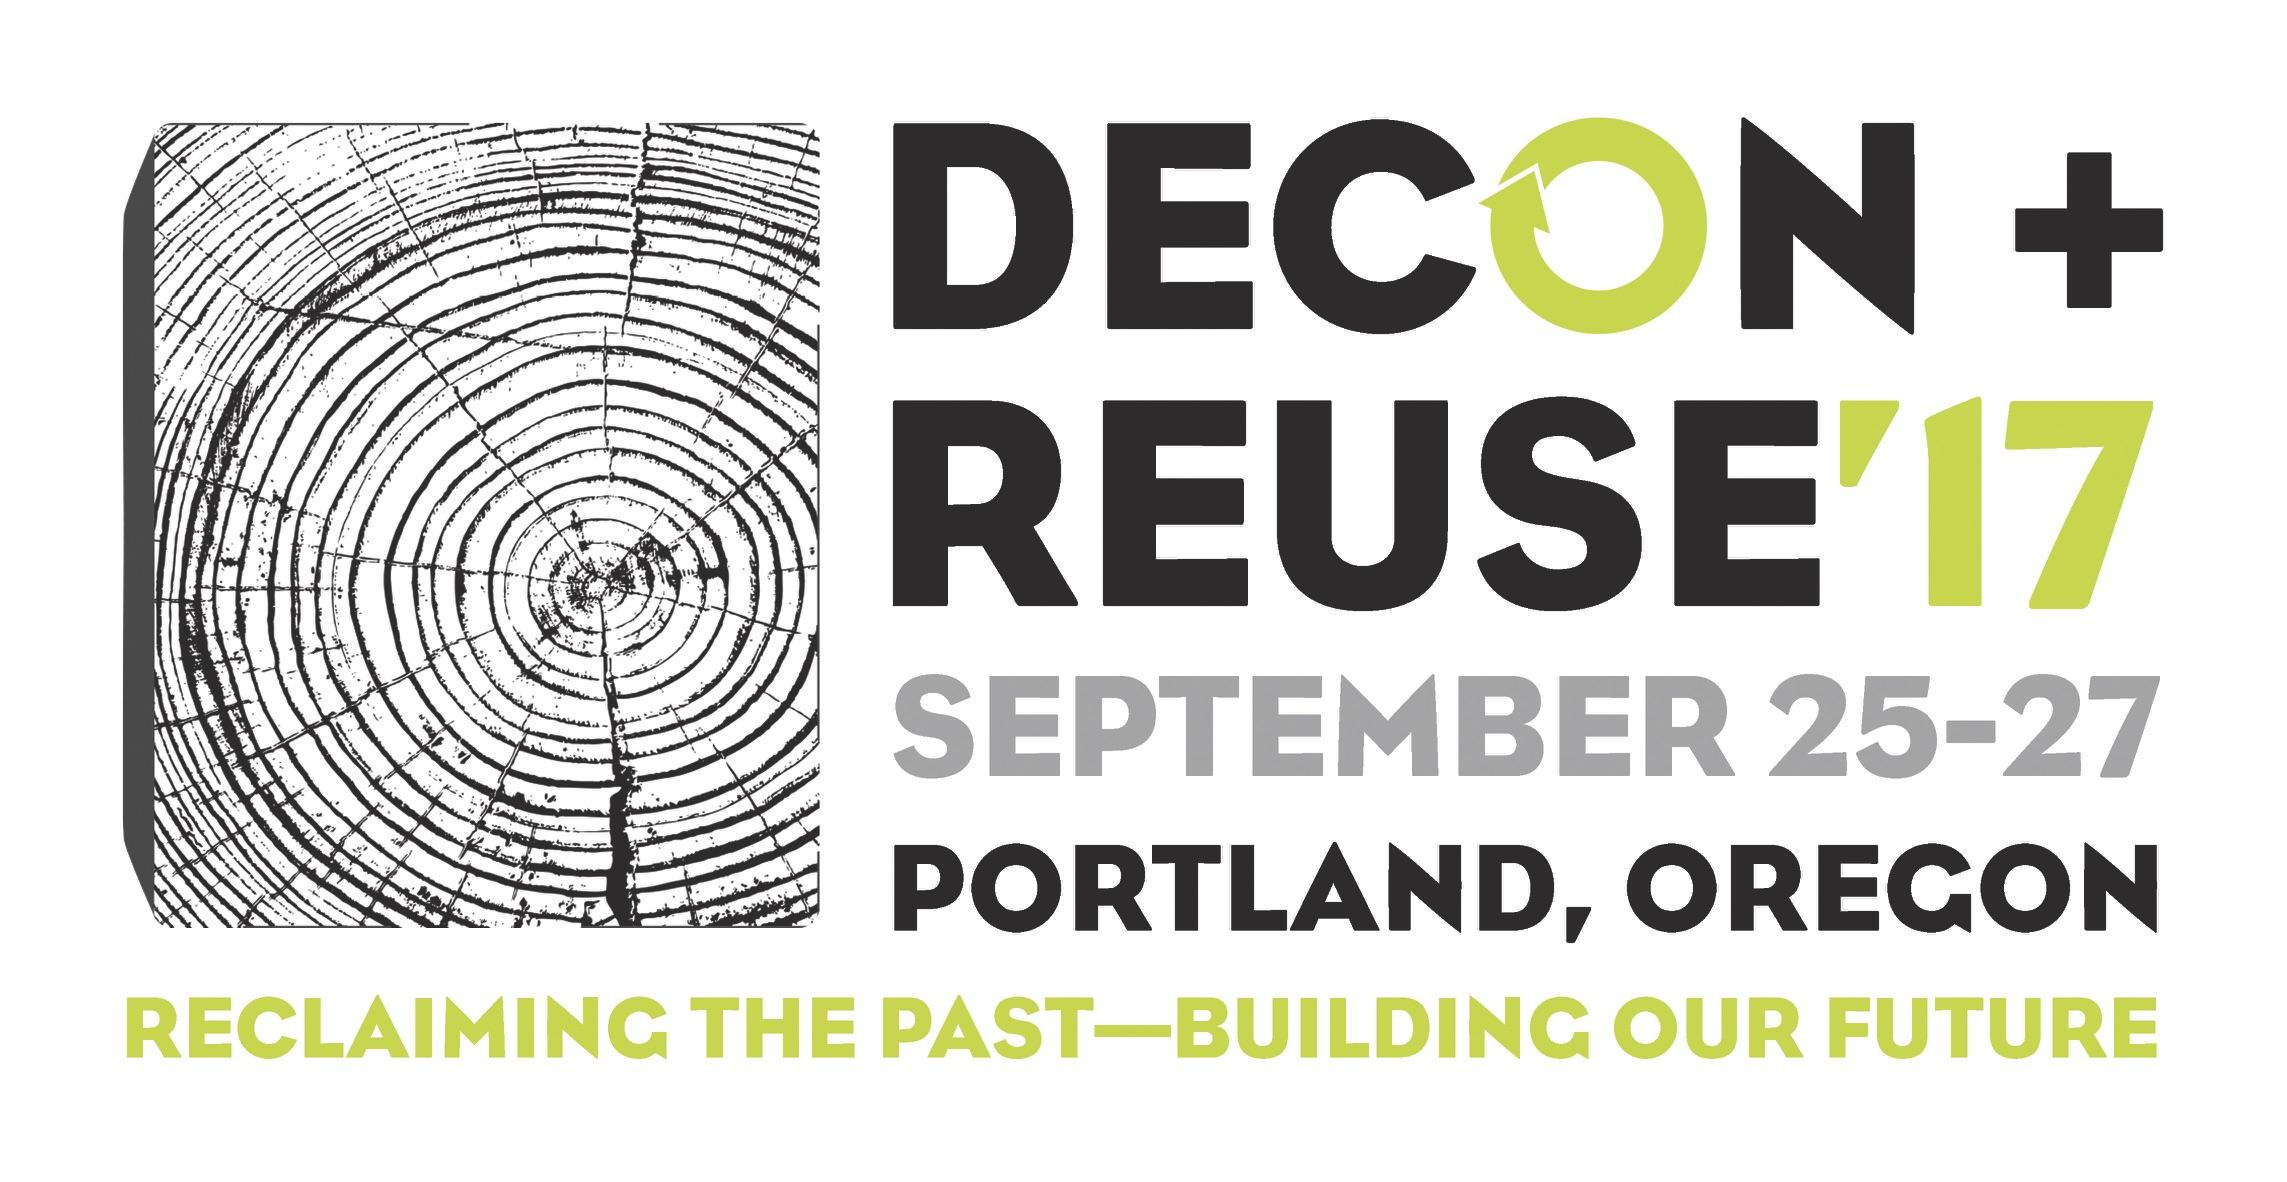 decon and reuse 17 [print].jpg